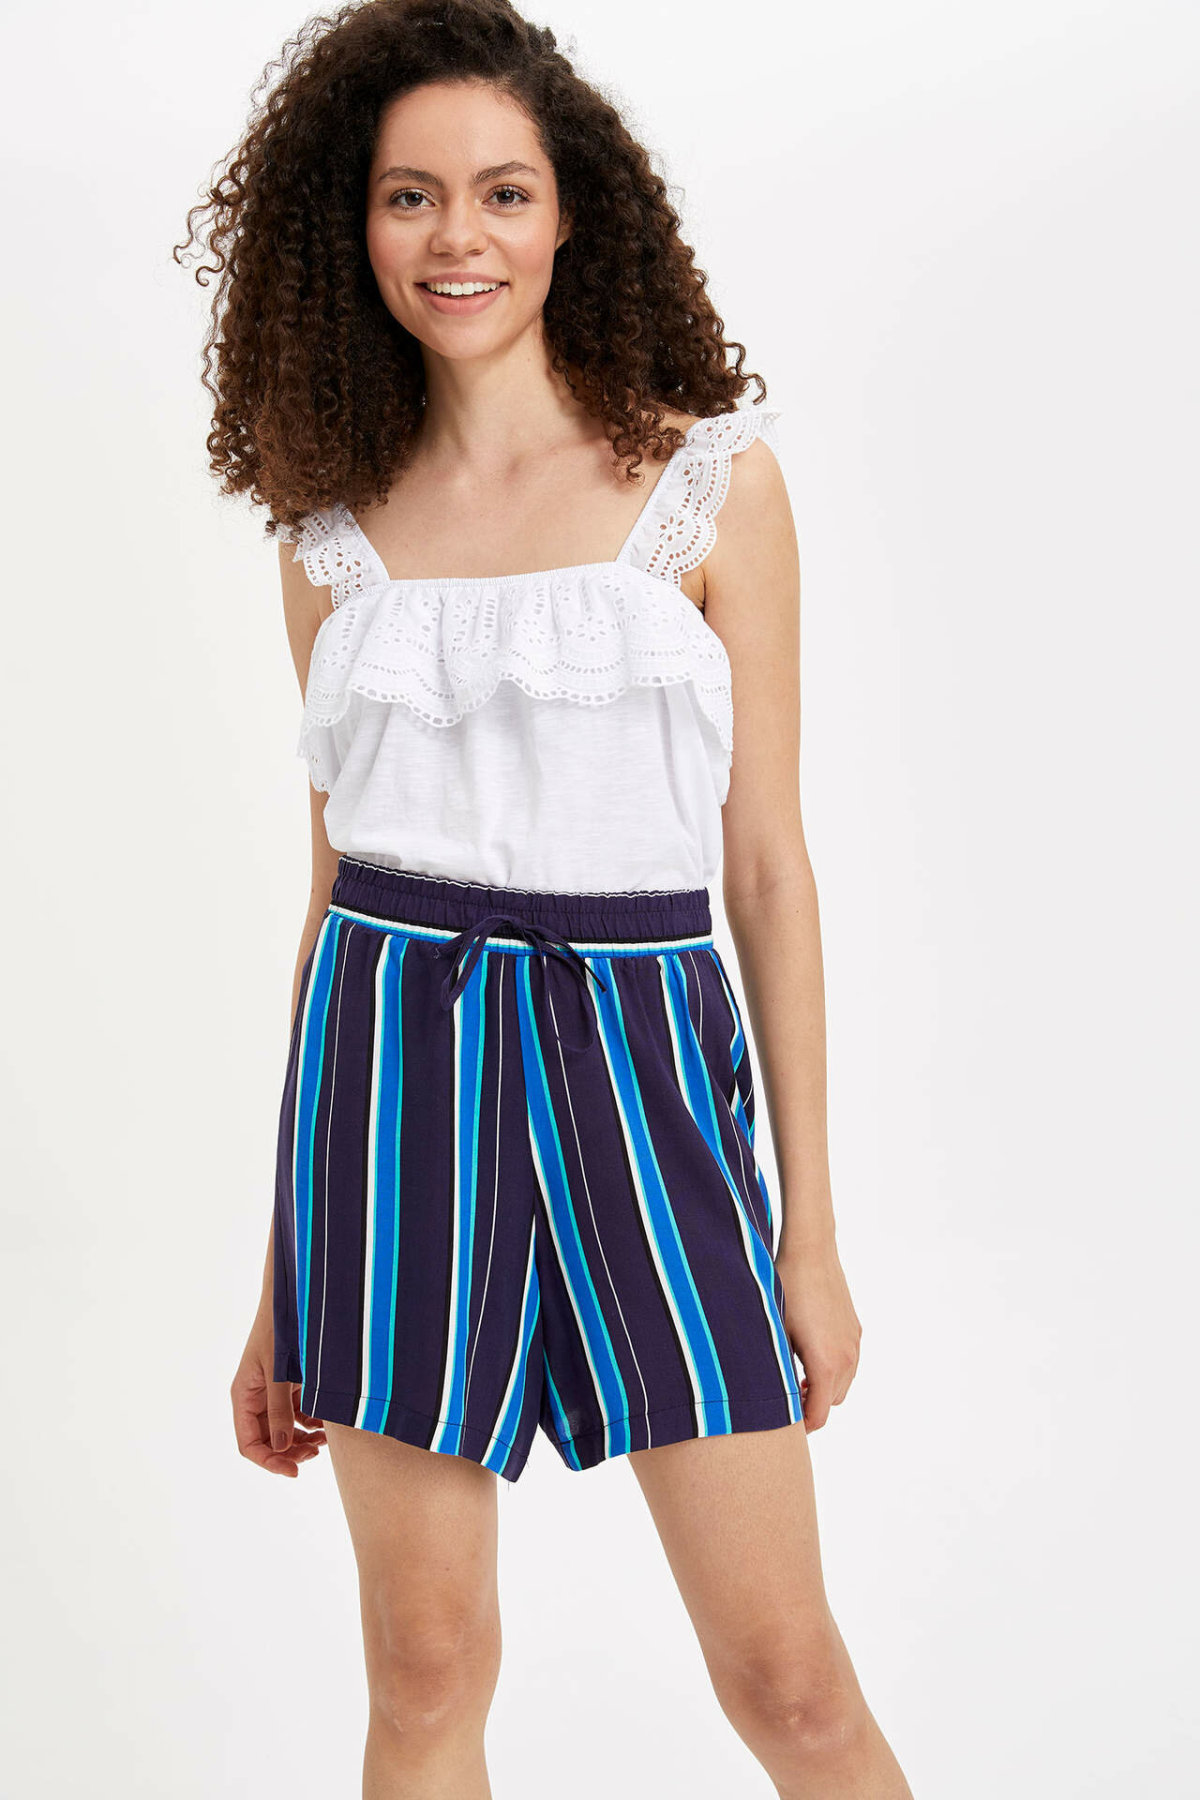 DeFacto Summer Women Short Pants Ladies Casual Striped Loose Shorts Female Drawstring Comfort Bottoms New - L2957AZ19HS